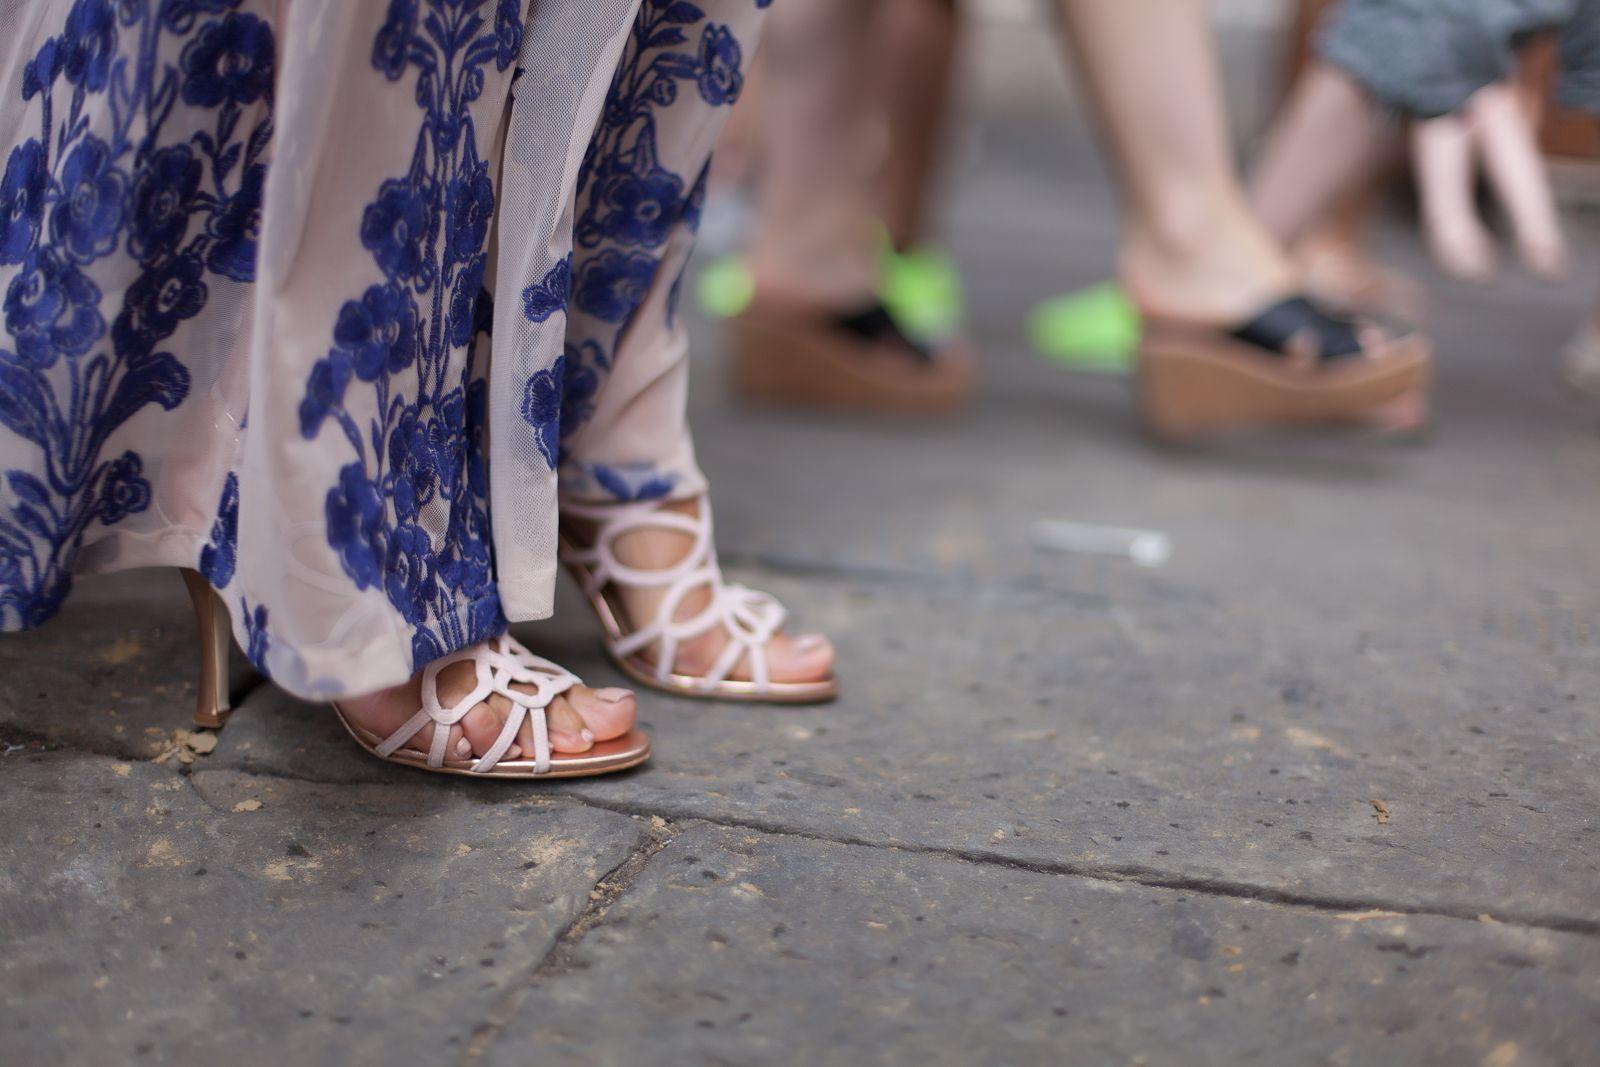 Mina buenosaires sandals